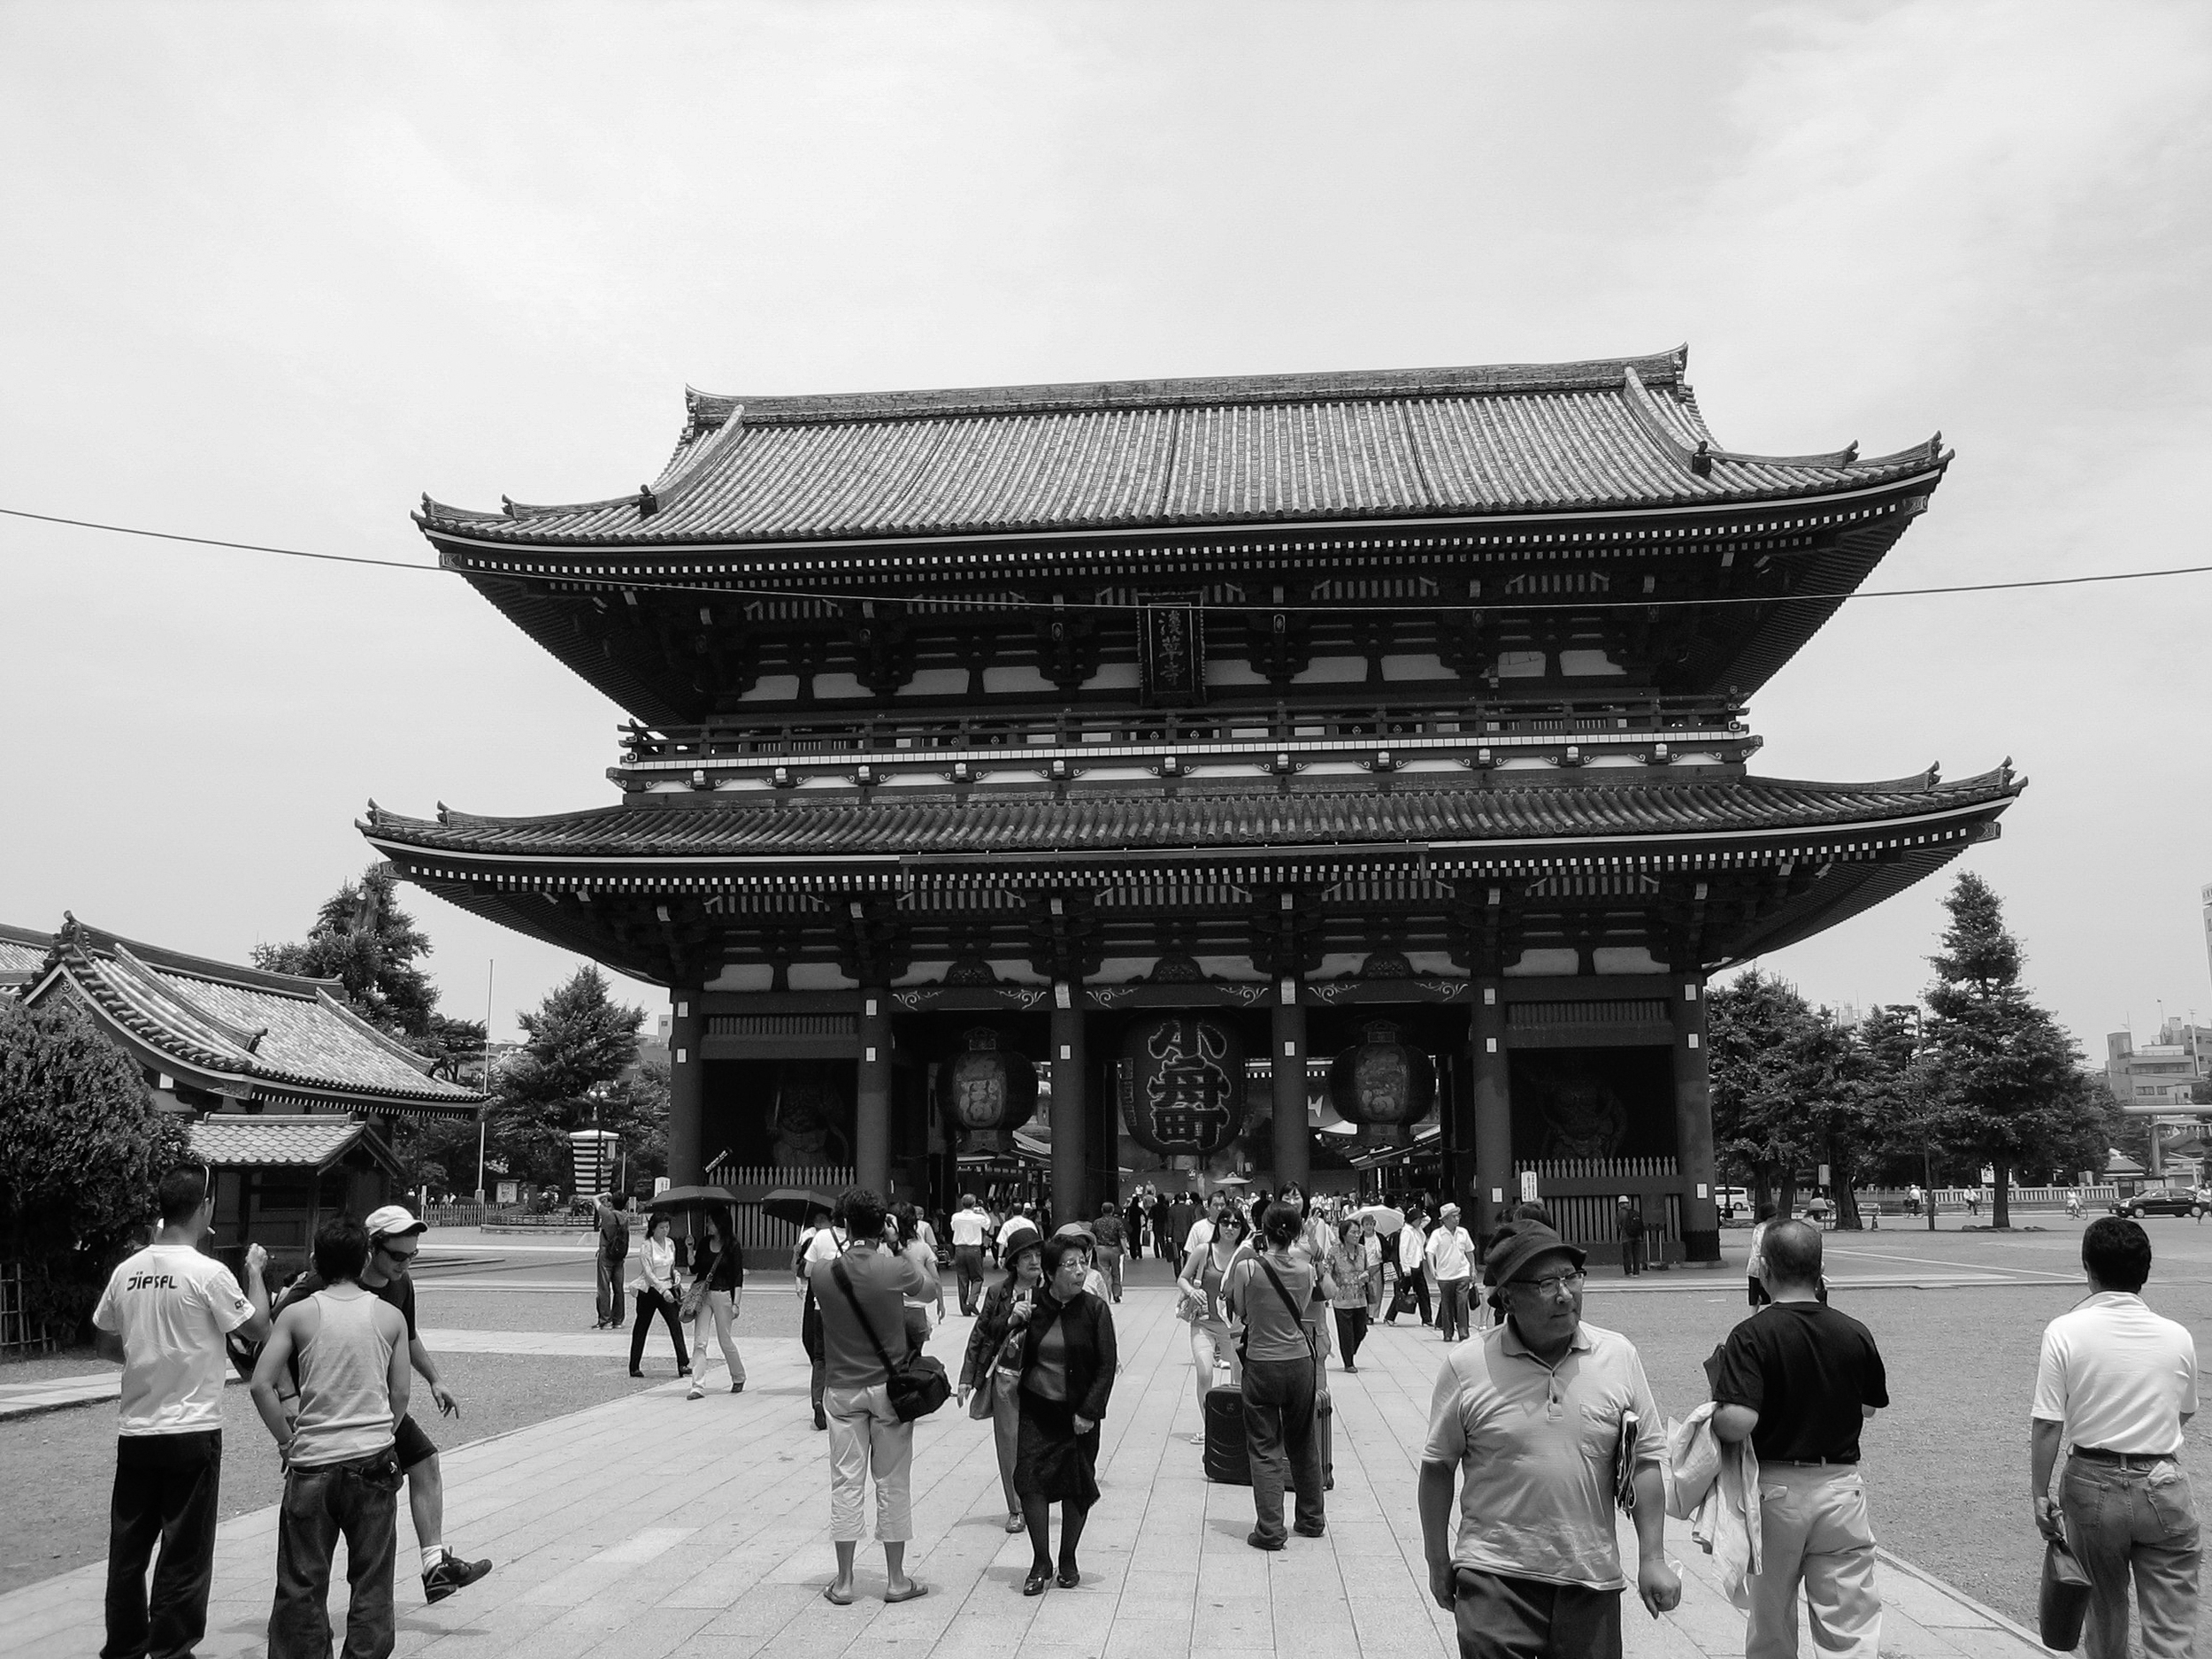 The massive main gate of Sensō-ji in Asakusa, Tokyo, featuring the iconic massive red lantern.